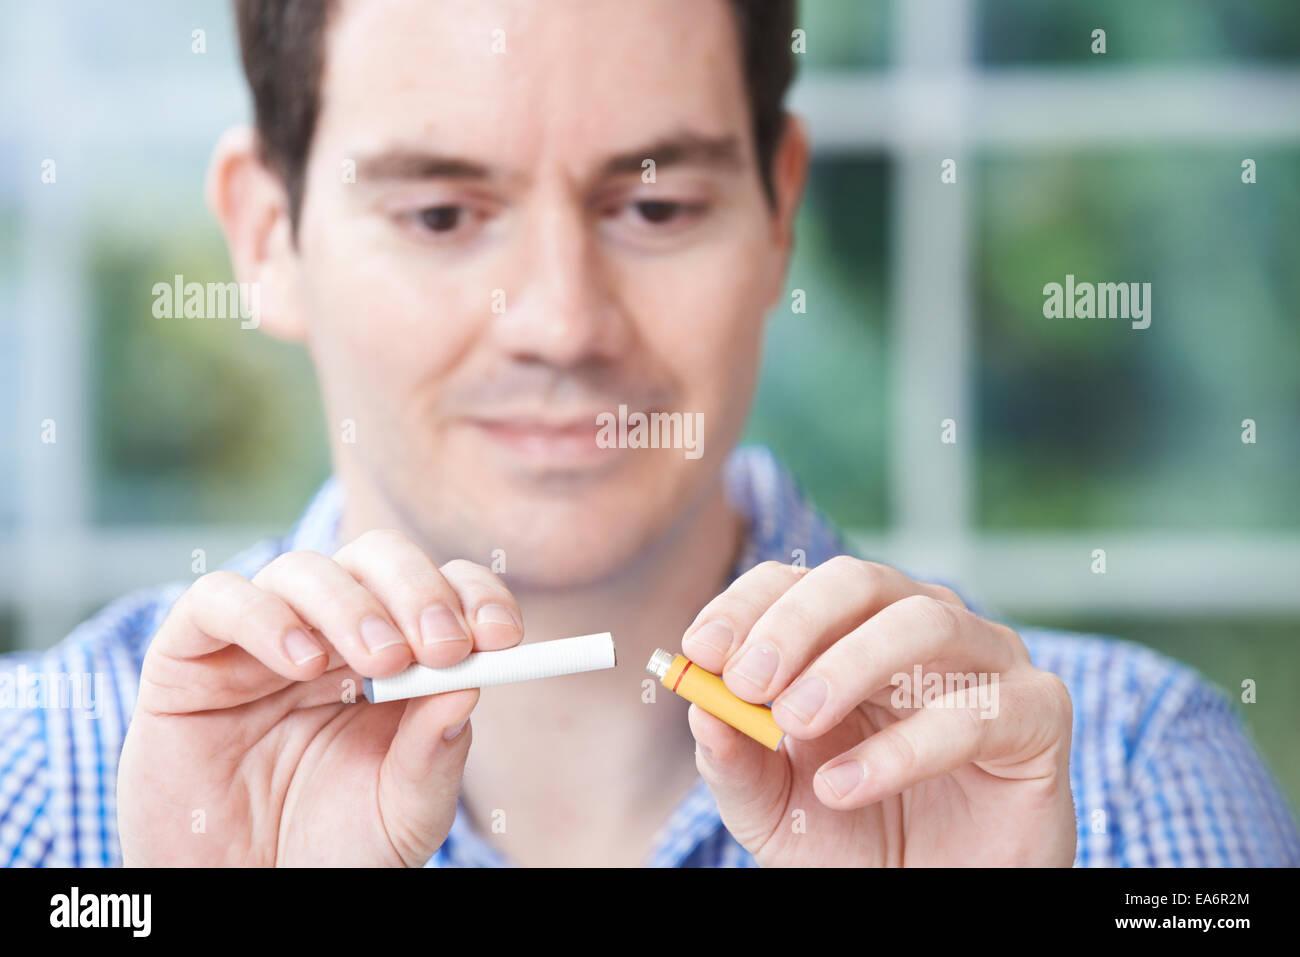 Man Using Electronic Cigarette To Stop Smoking - Stock Image